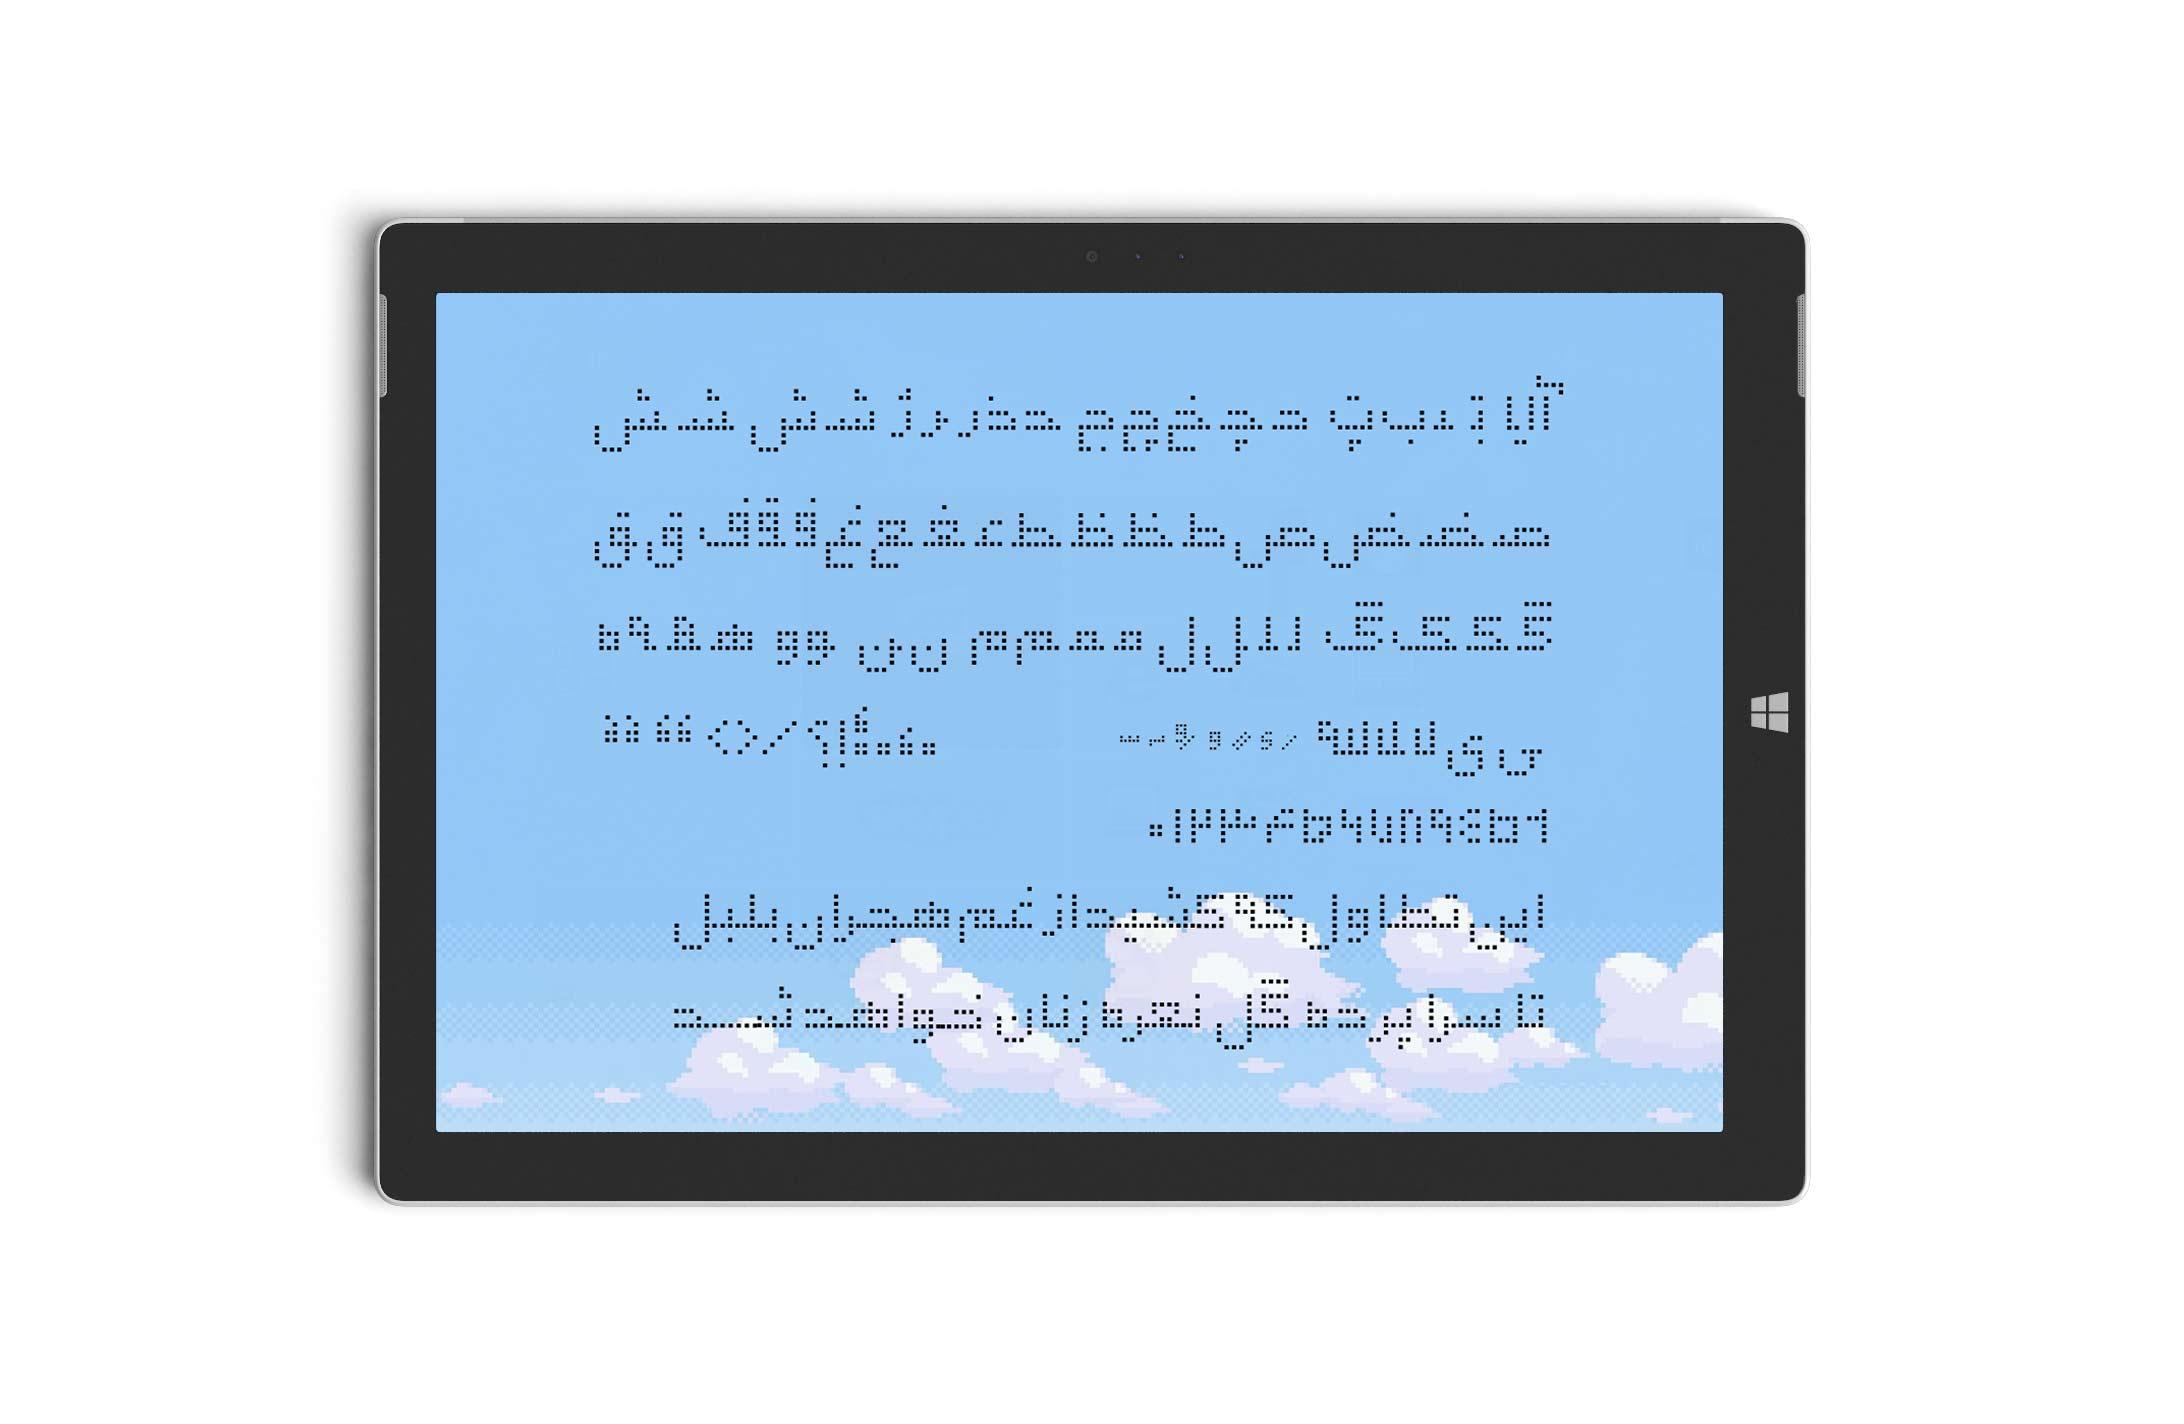 8bit-font-pixeler-4